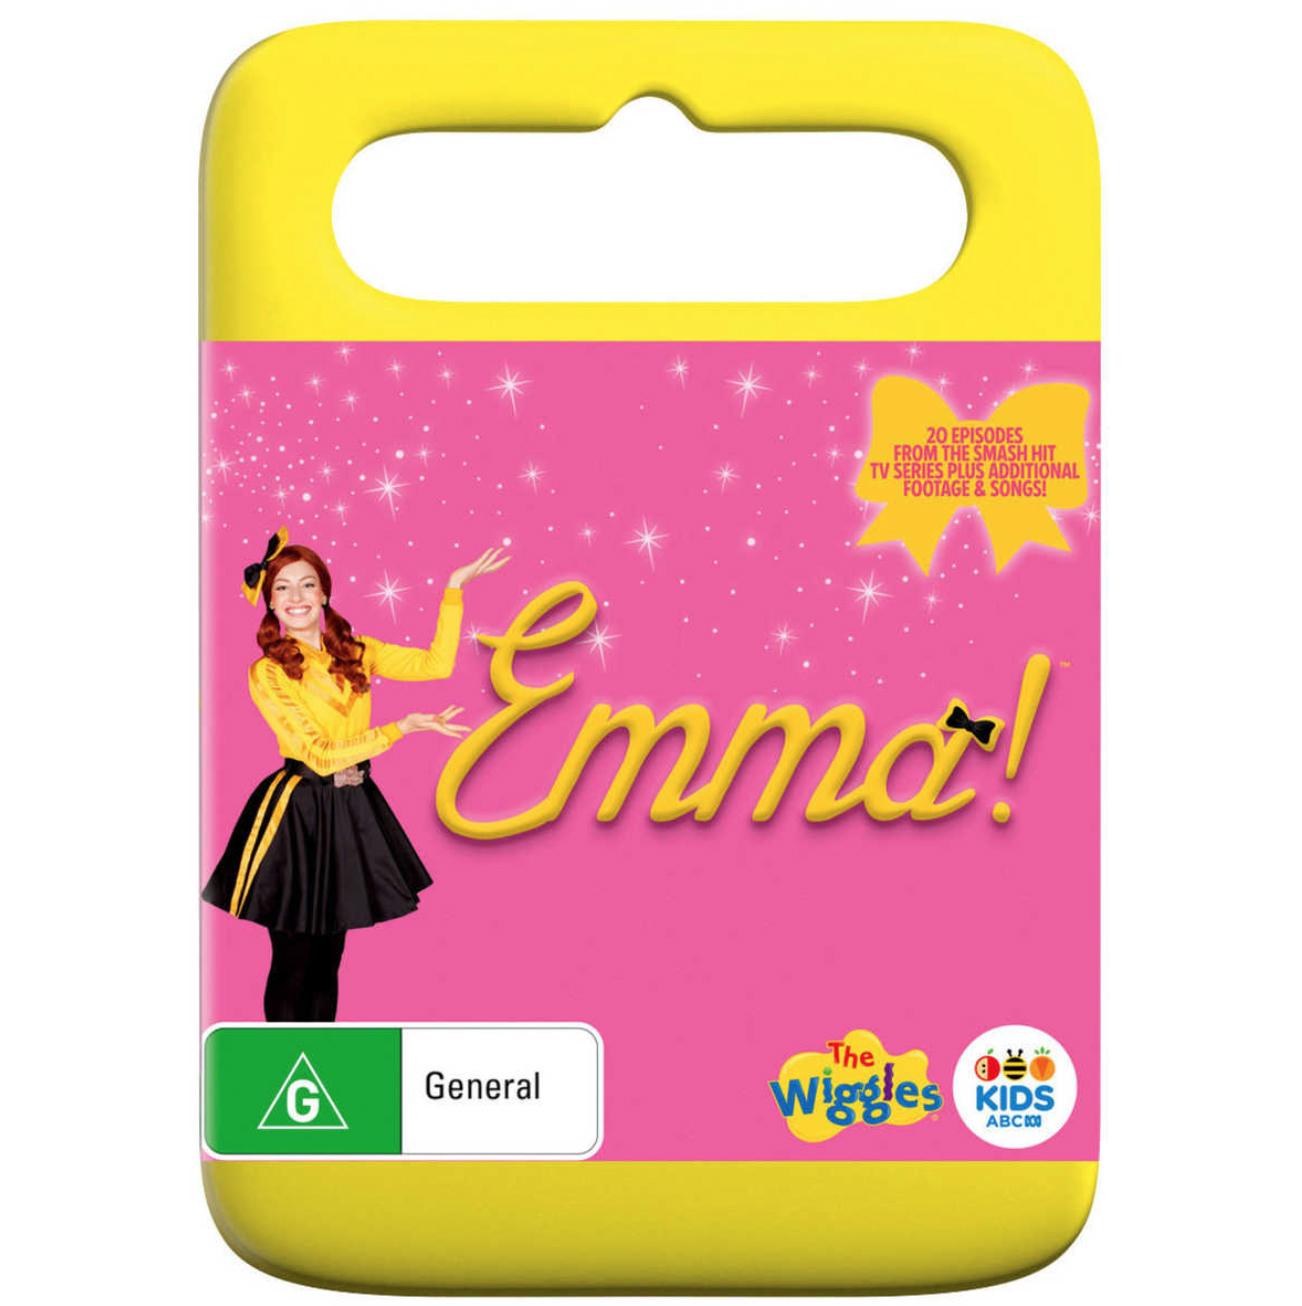 Emma Wiggle DVD